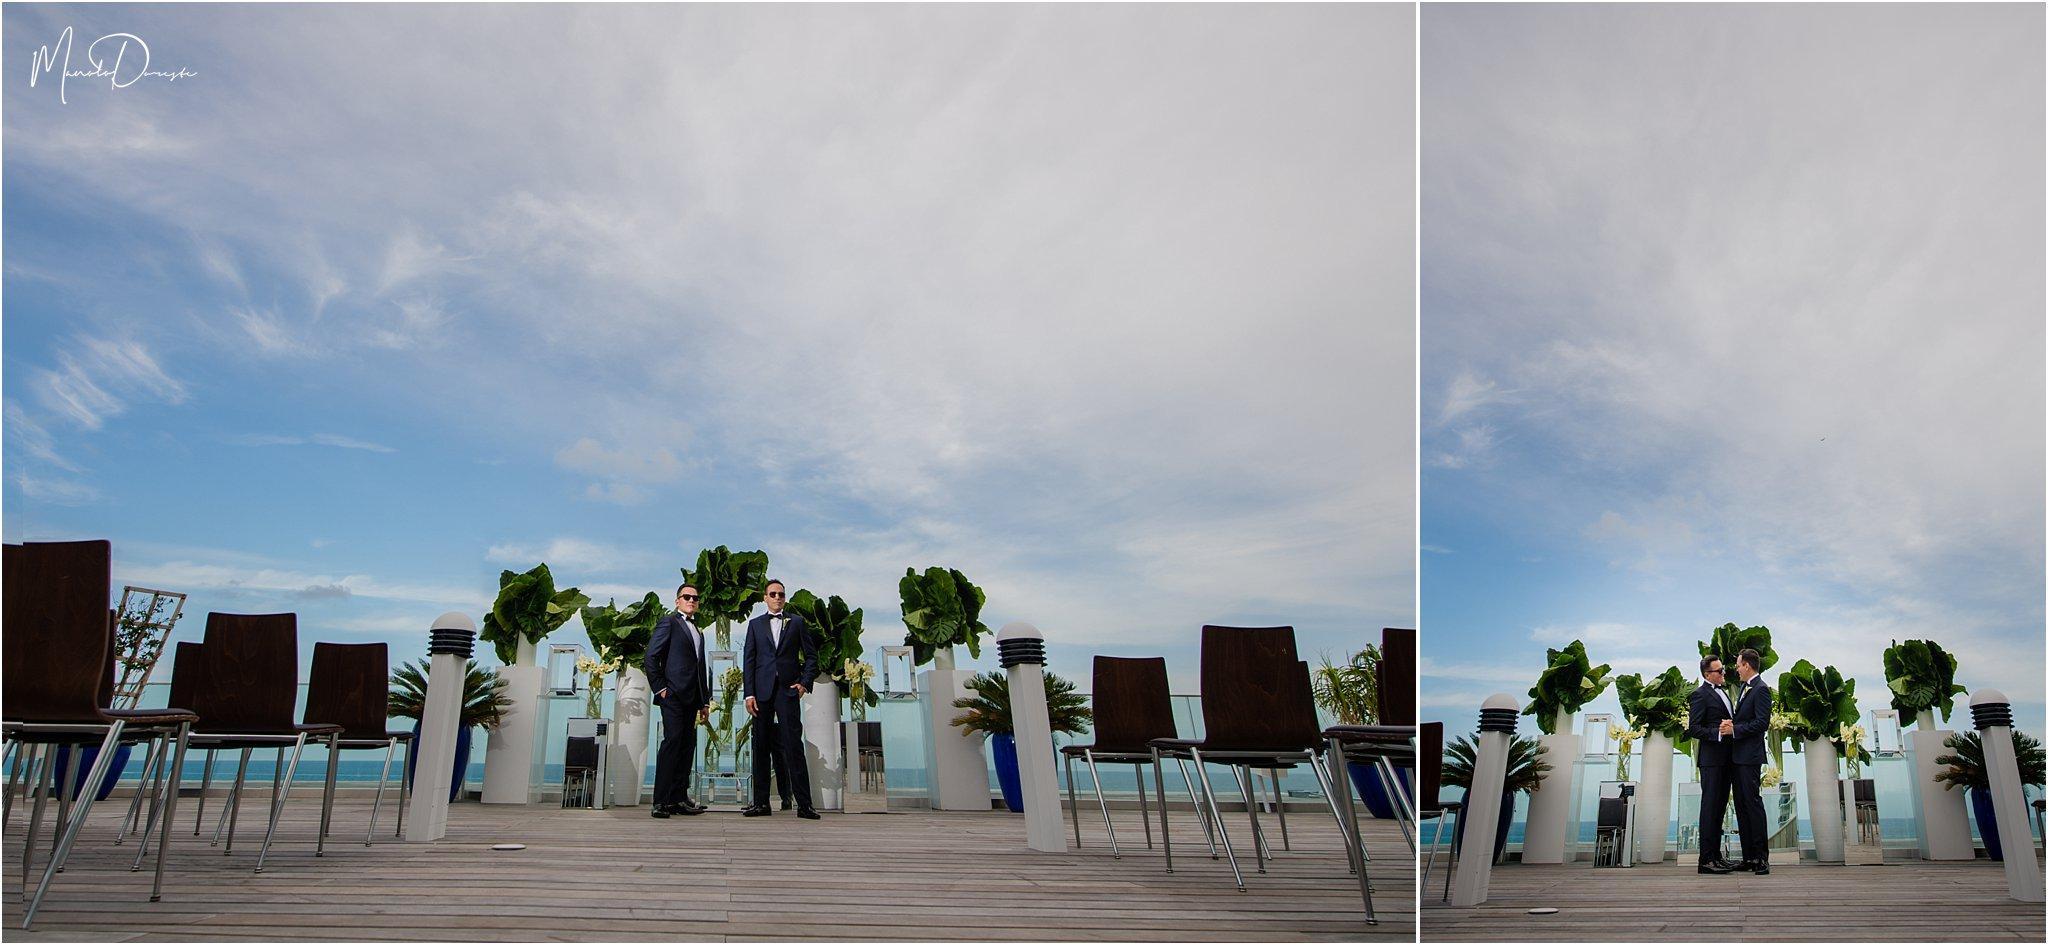 0186_ManoloDoreste_InFocusStudios_Wedding_Family_Photography_Miami_MiamiPhotographer.jpg